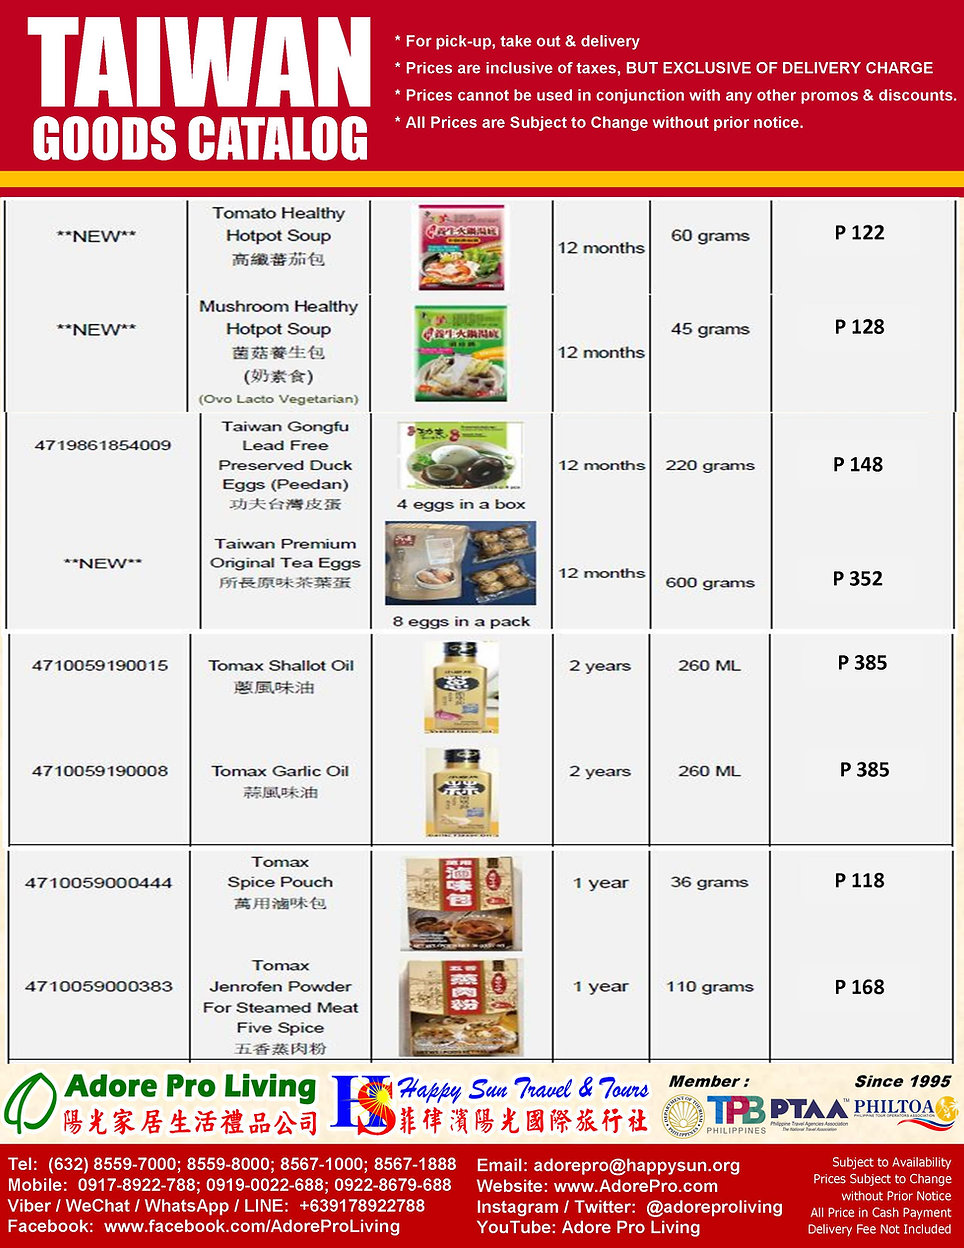 P16_Taiwan Goods Catalog_202009119.jpg